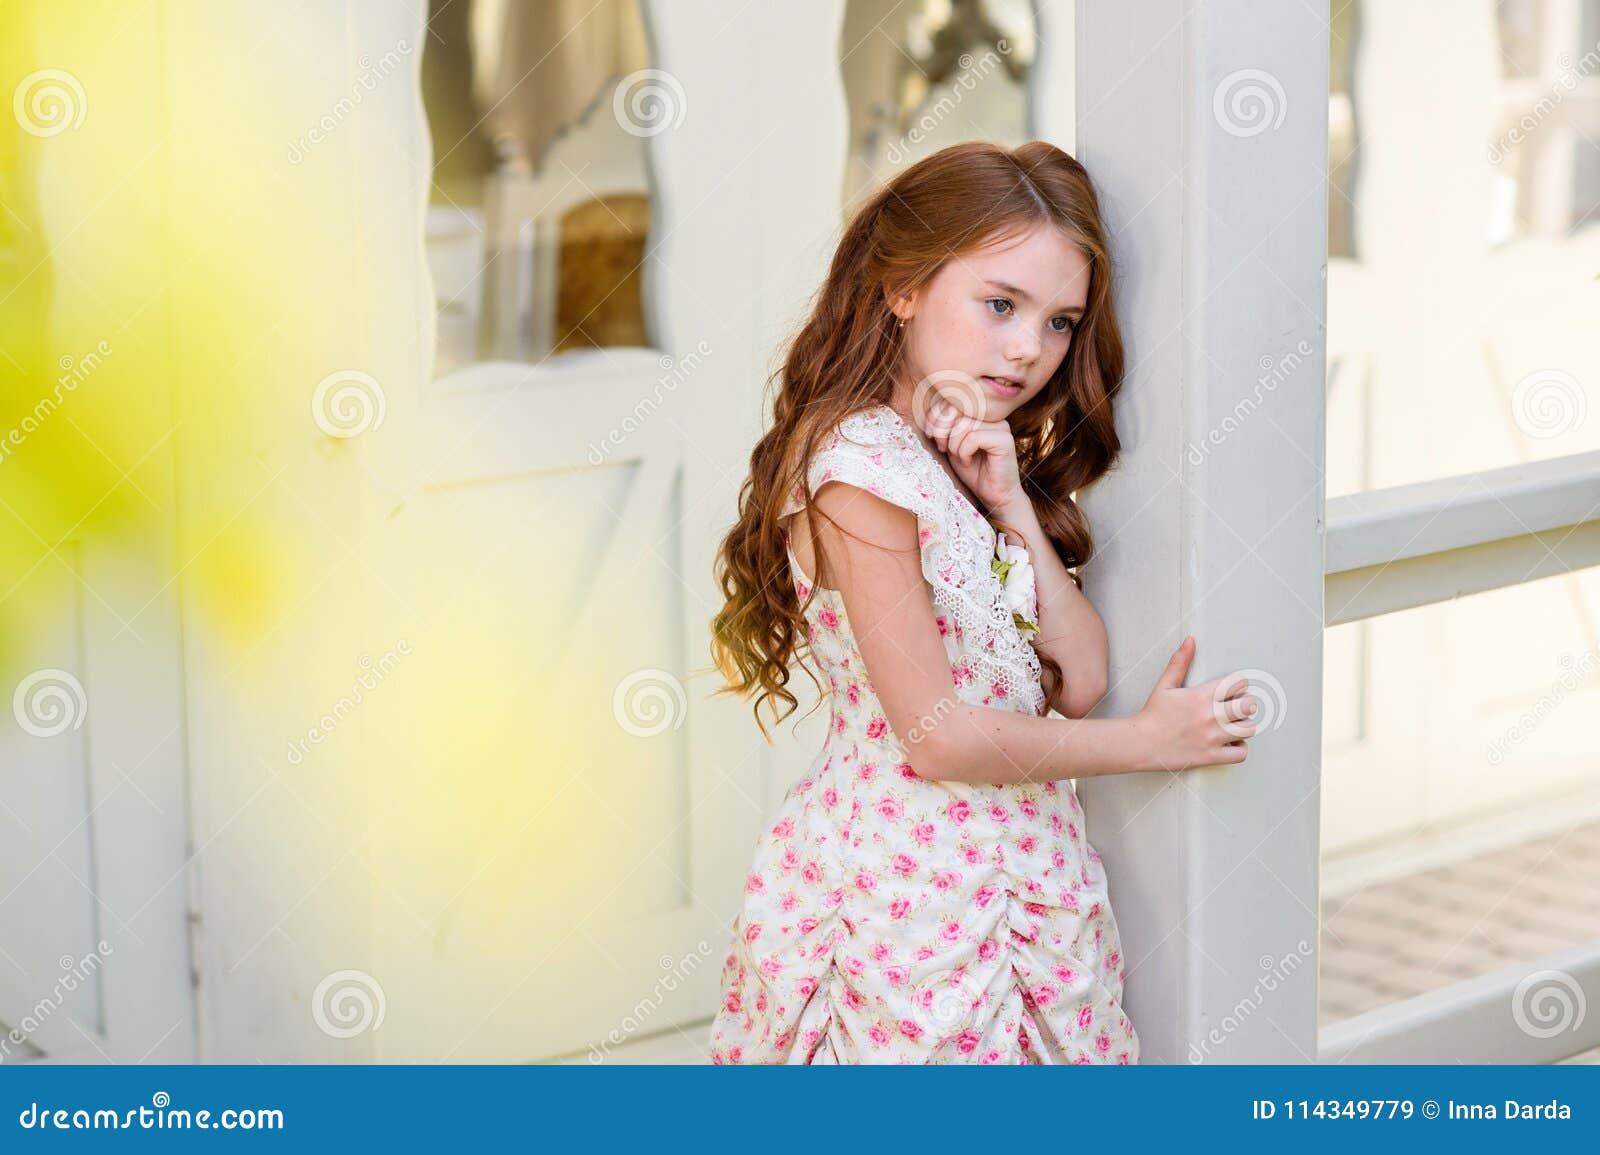 Beautiful young girl outdoors.